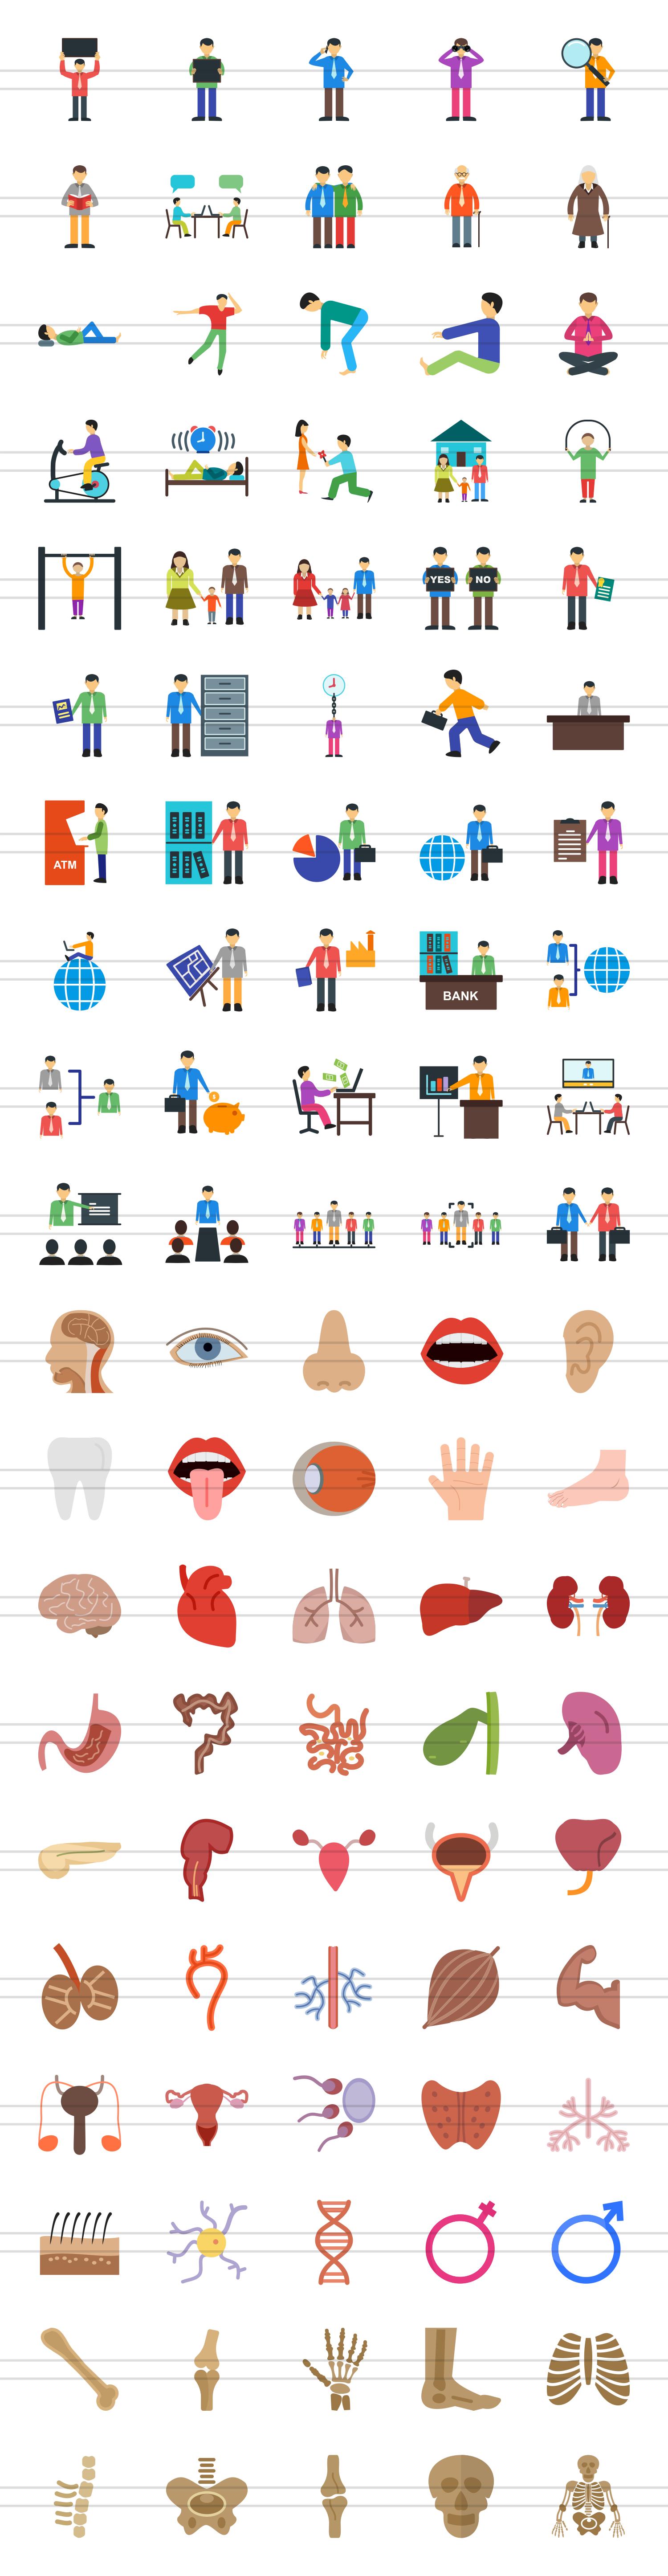 100 Humans & Anatomy Flat Icons example image 2